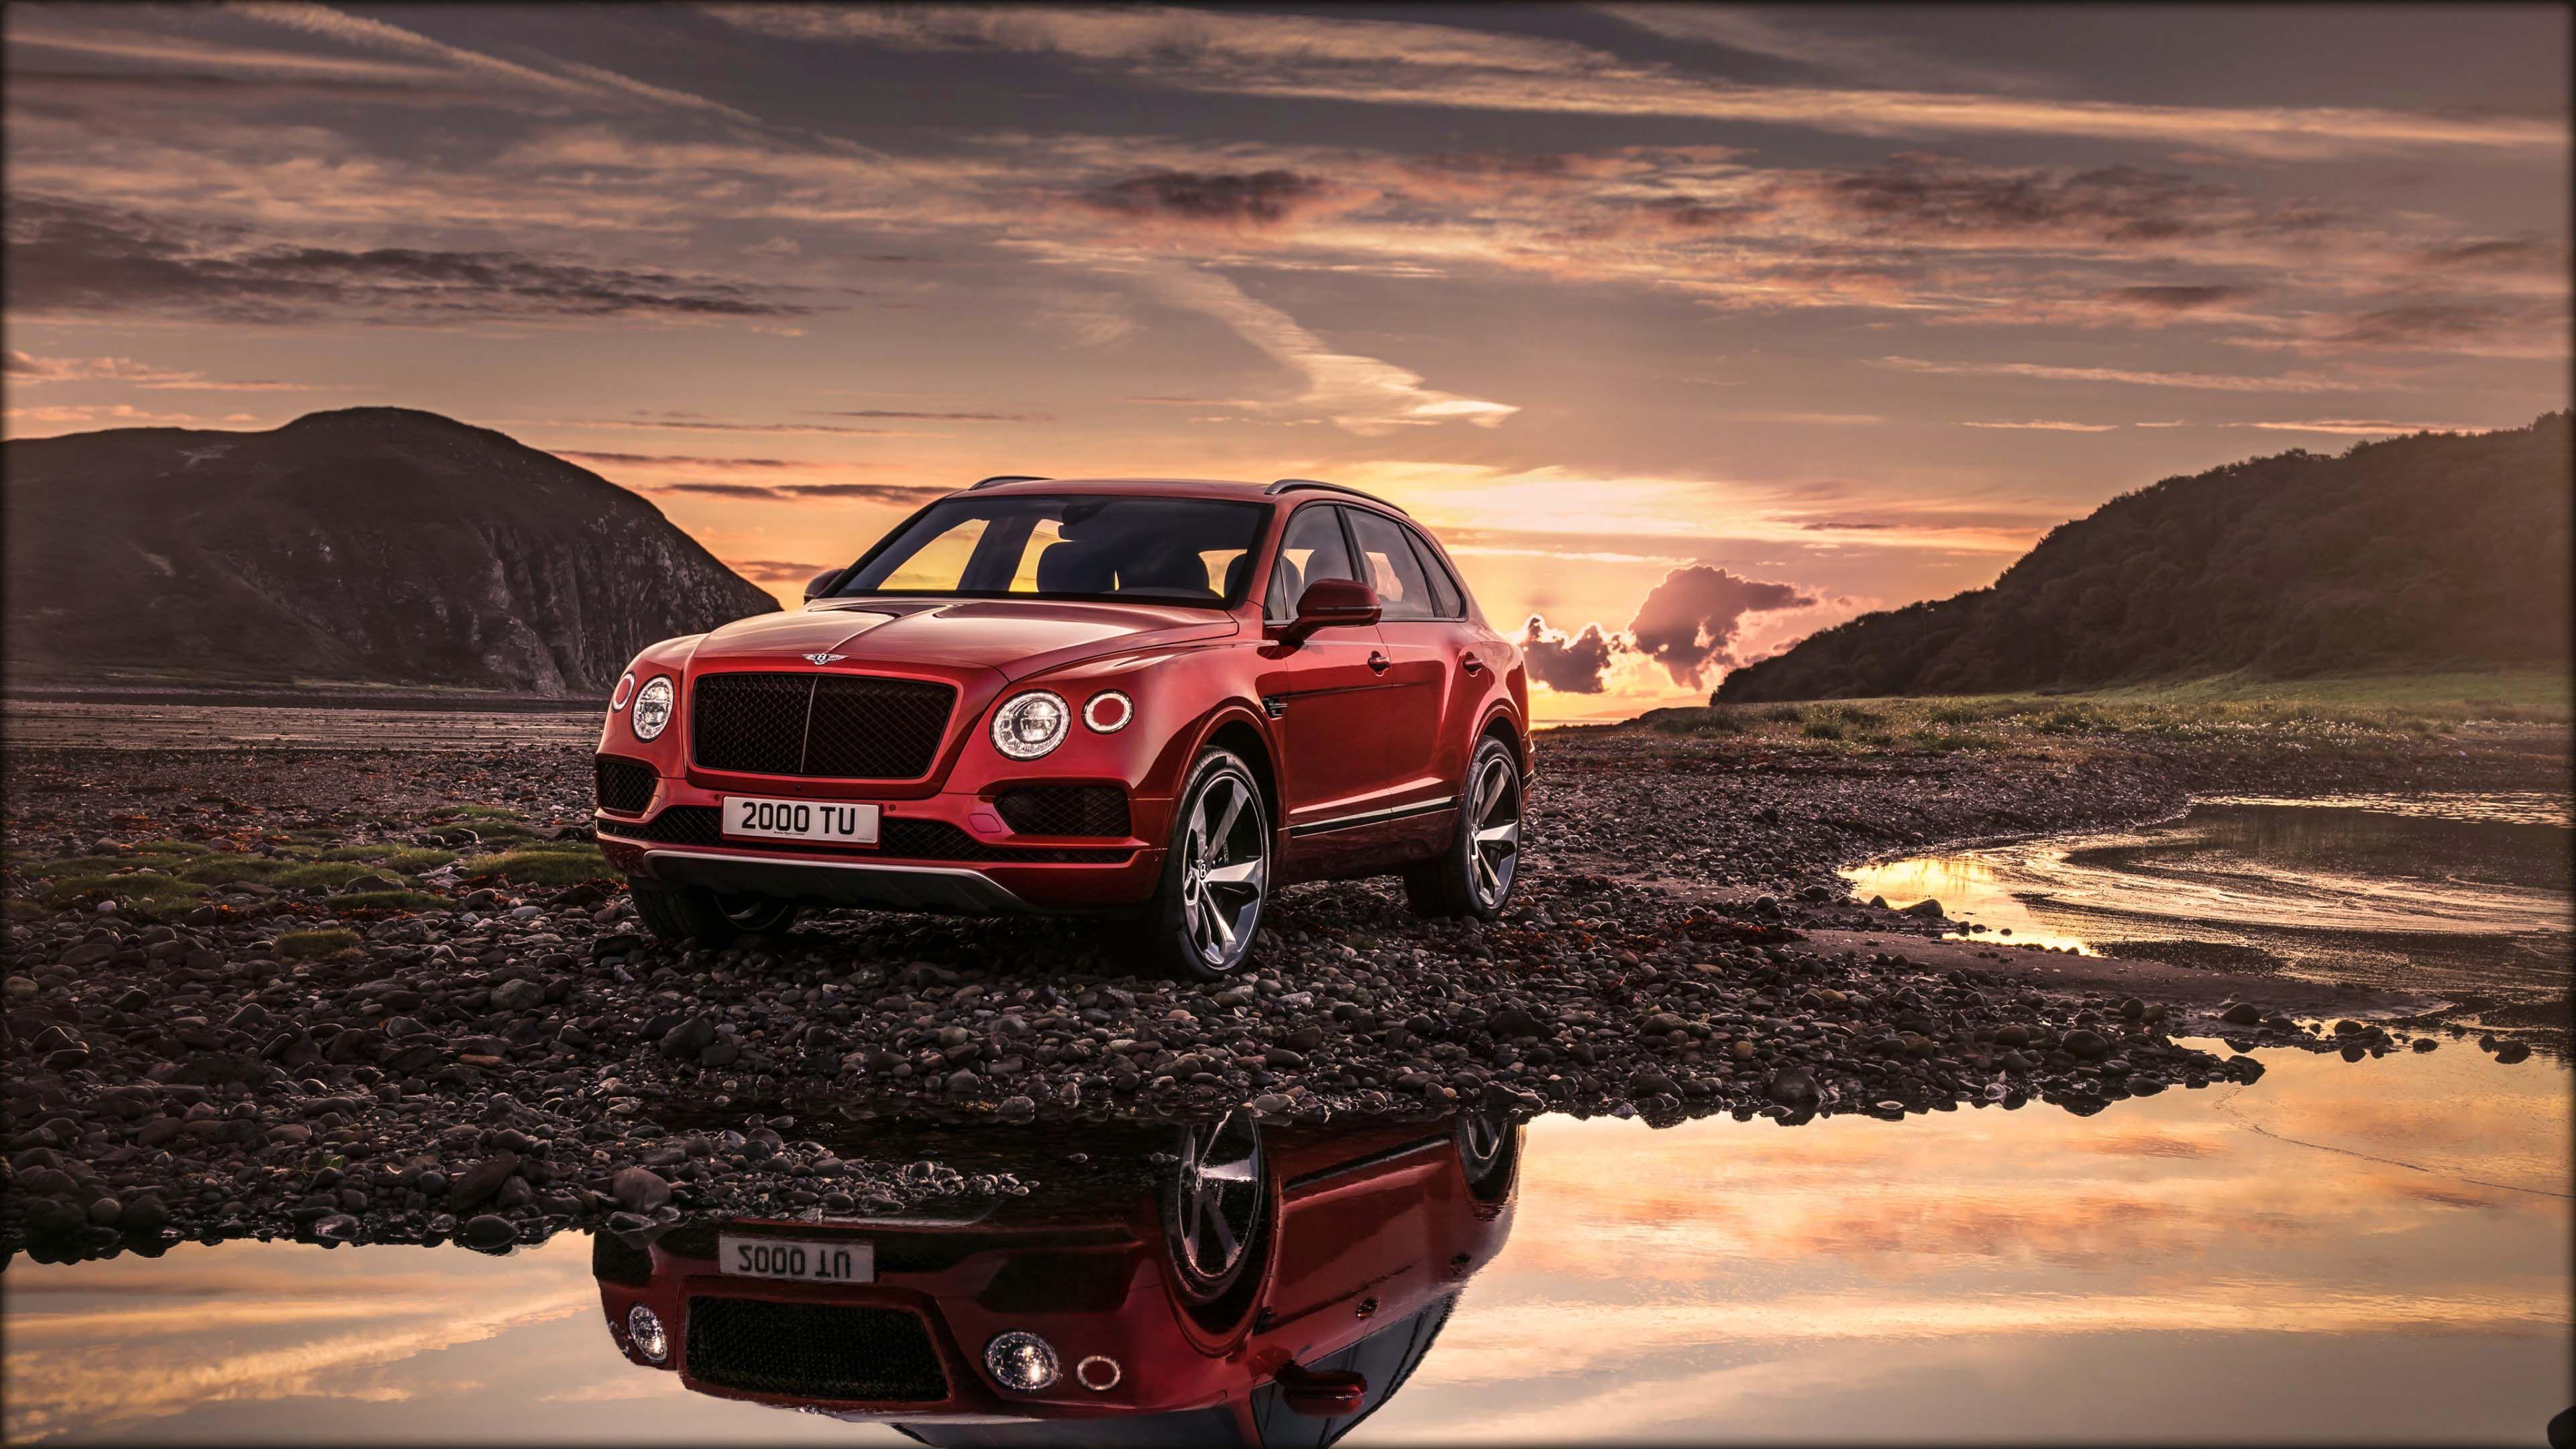 Image For Design Car 2018 Bentley Bentayga V8 4k Wallpaper